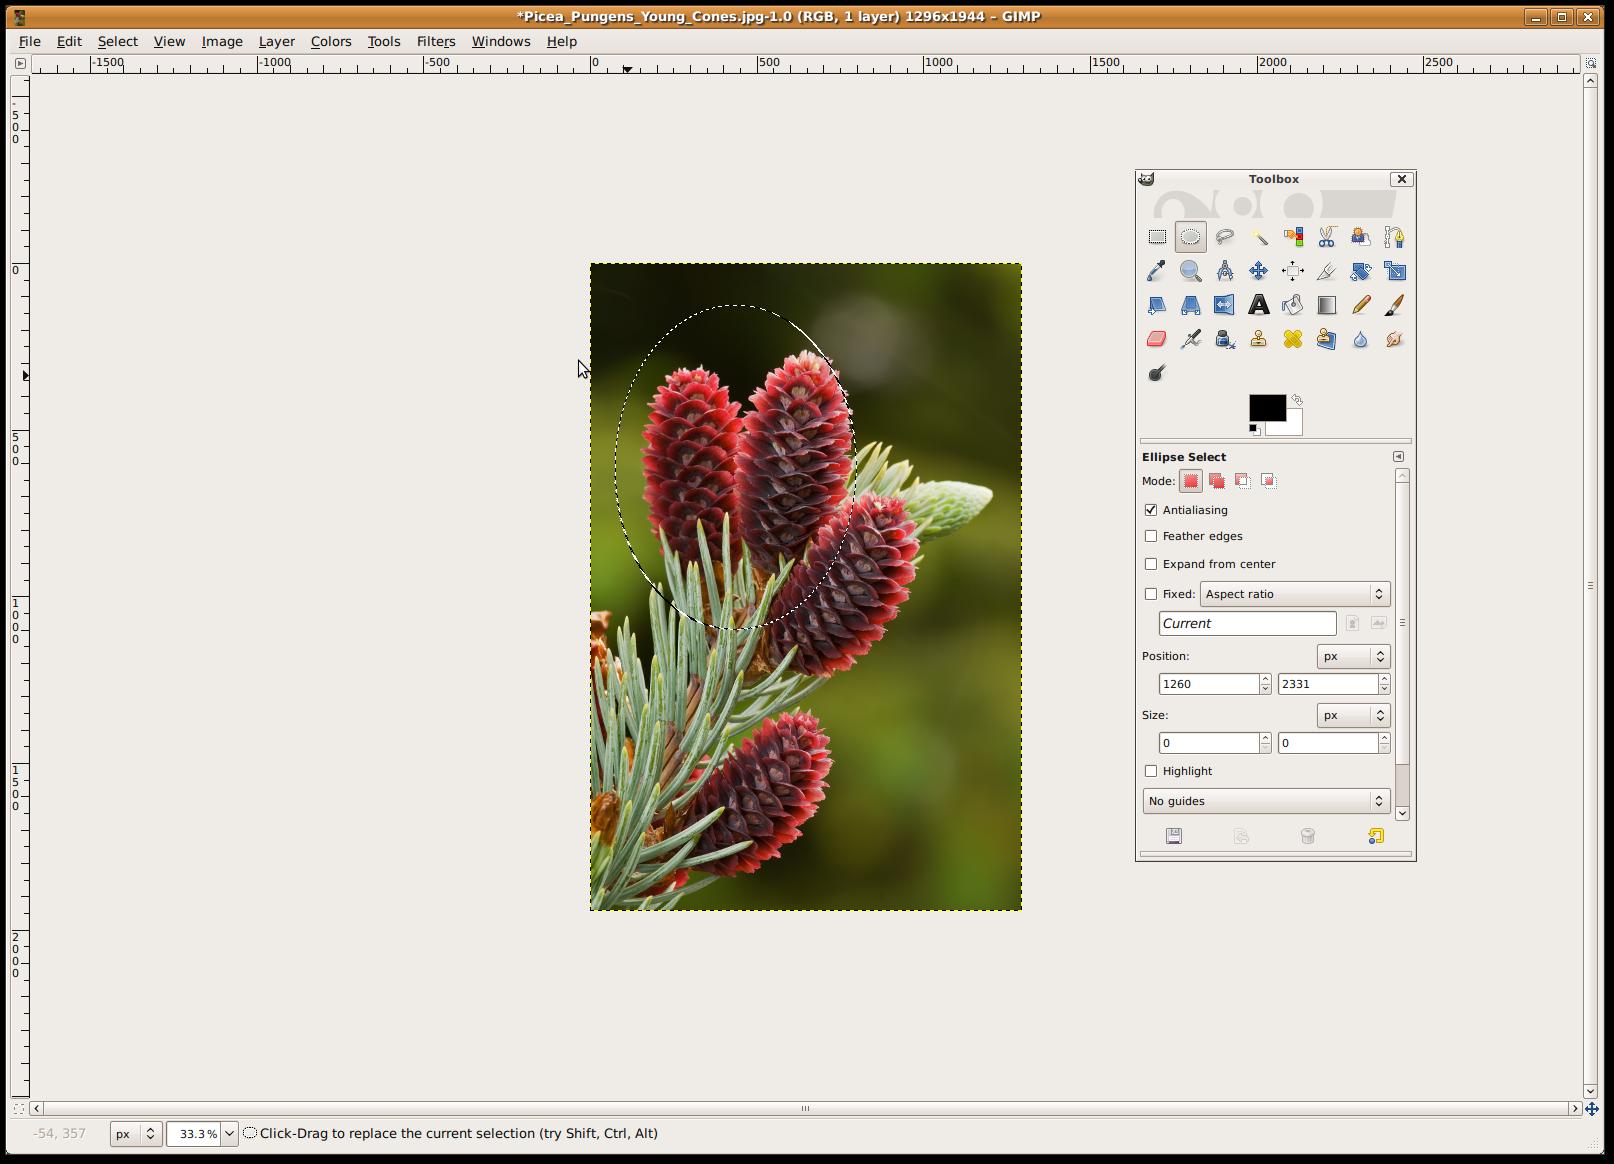 Adobe photoshop for ubuntu 1604 free download